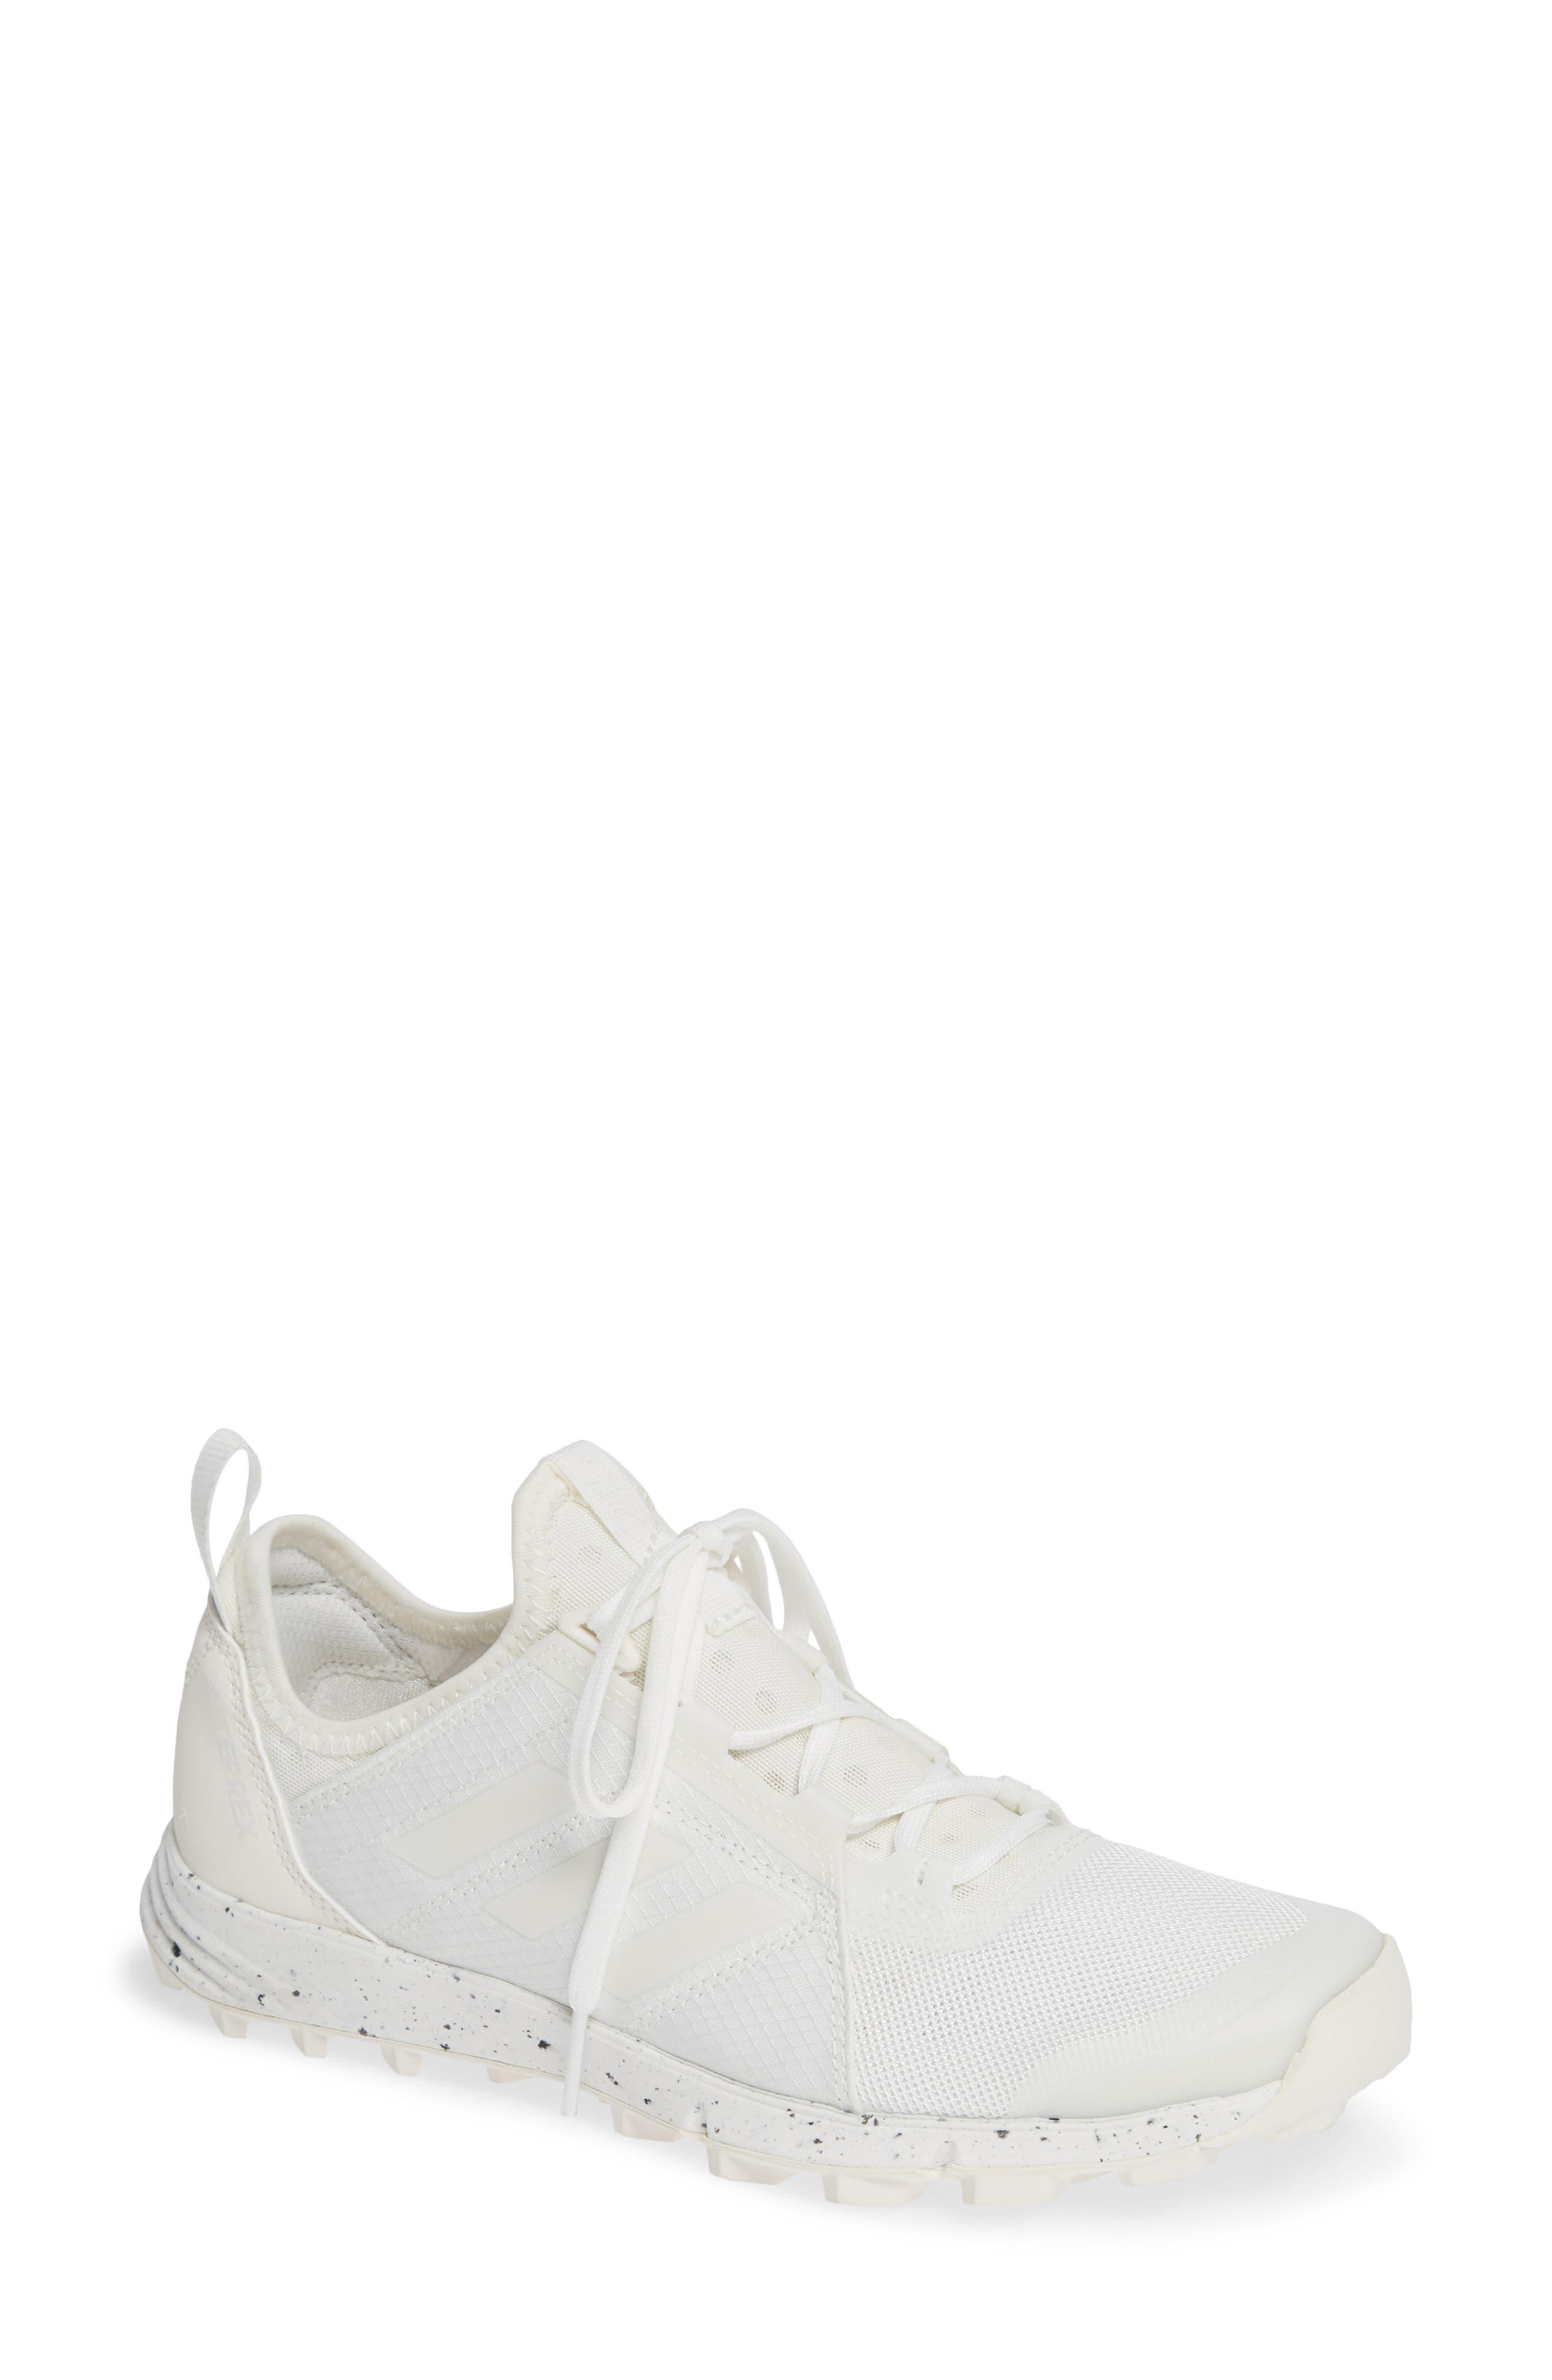 Terrex Agravic Speed Running Shoe,                             Main thumbnail 1, color,                             NON-DYED/ WHITE/ CHALK WHITE